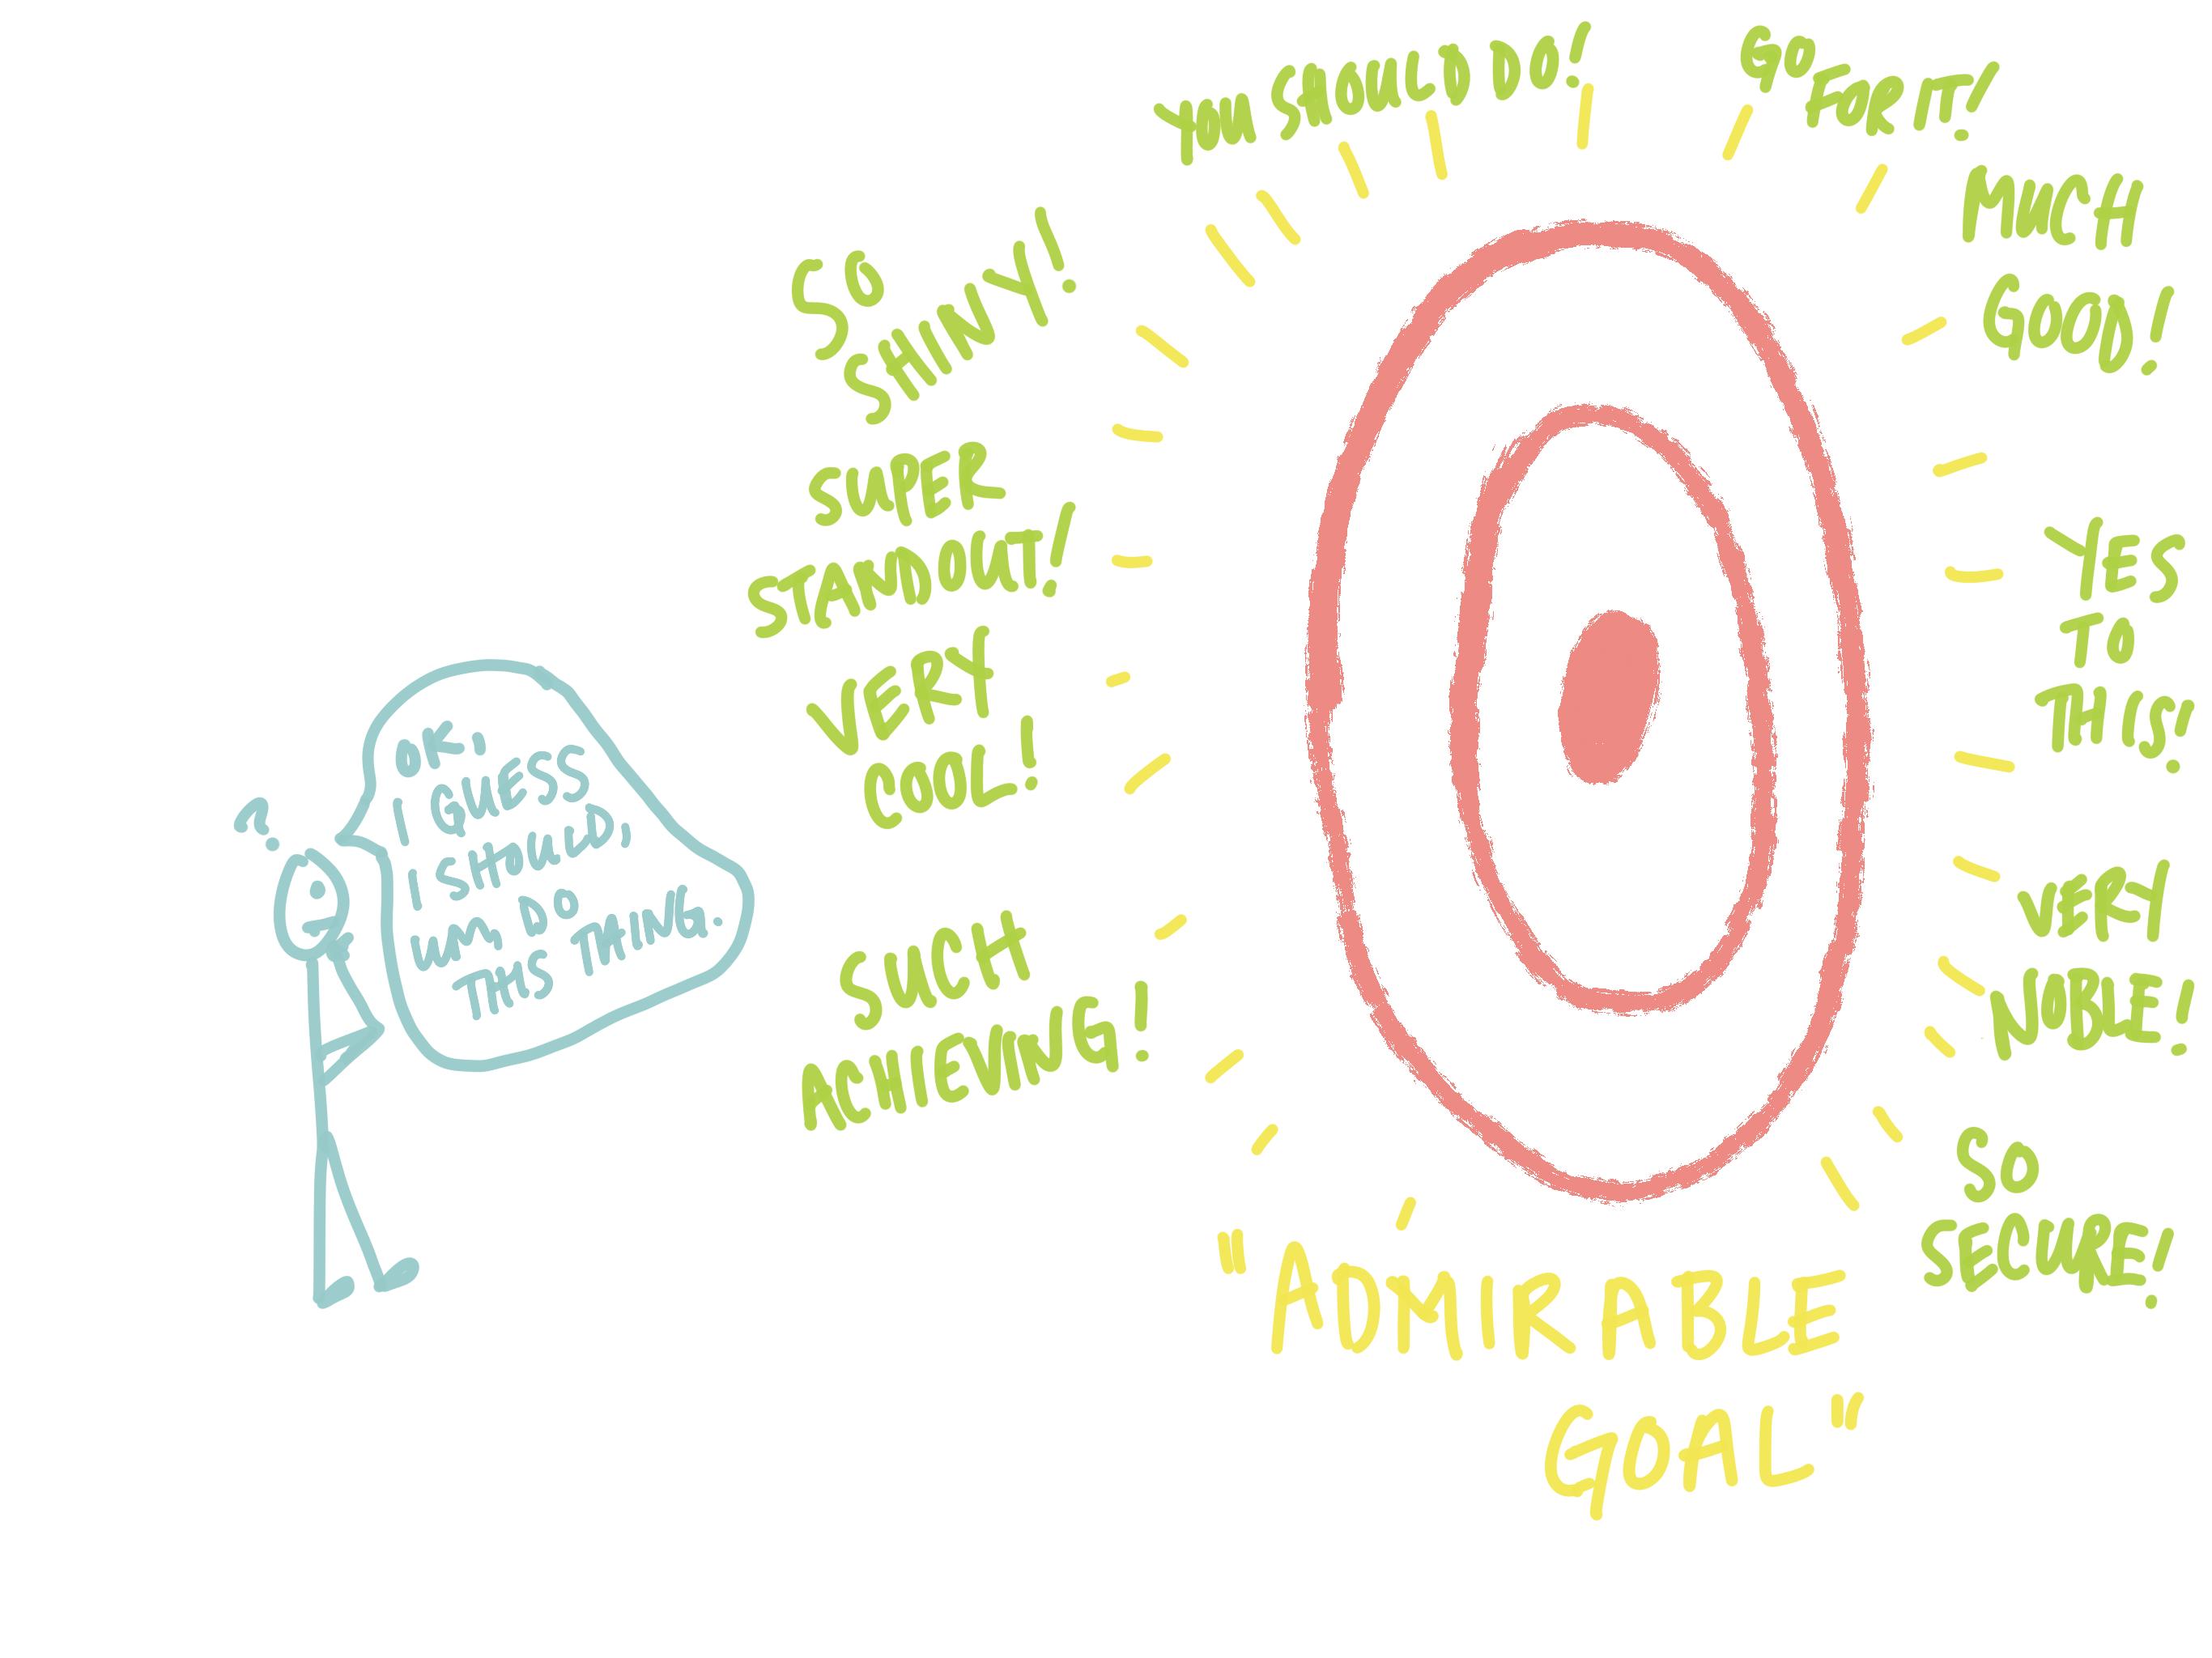 Admirable goal